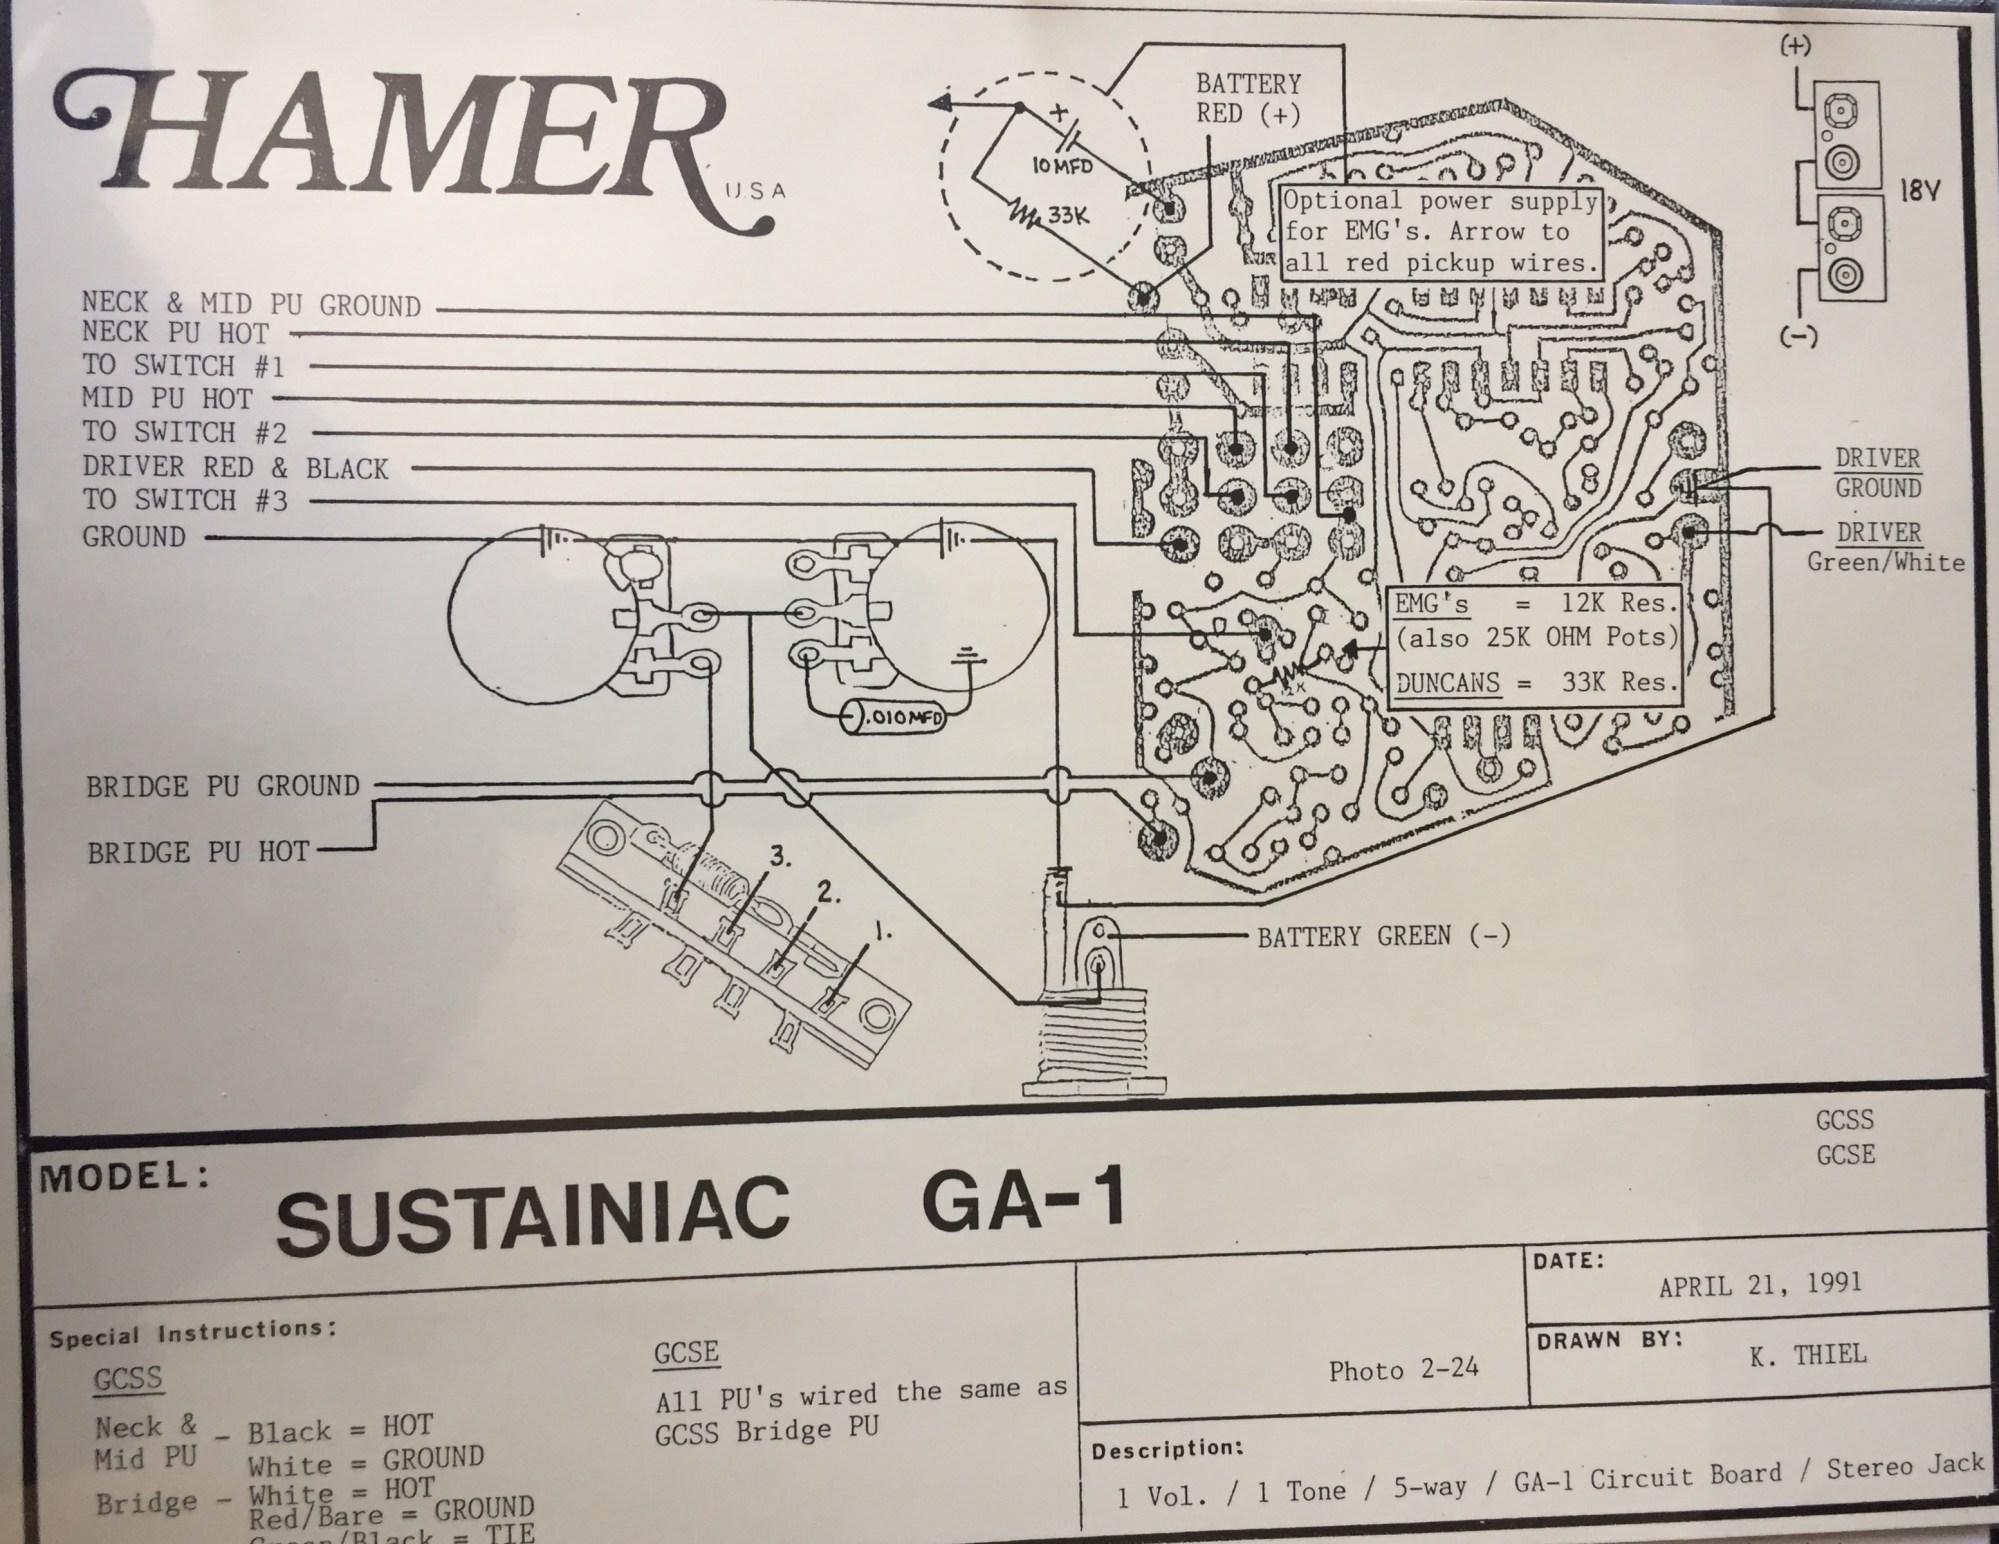 hight resolution of hamer wiring diagrams wiring diagram post hamer bass wiring diagram hamer wiring diagram